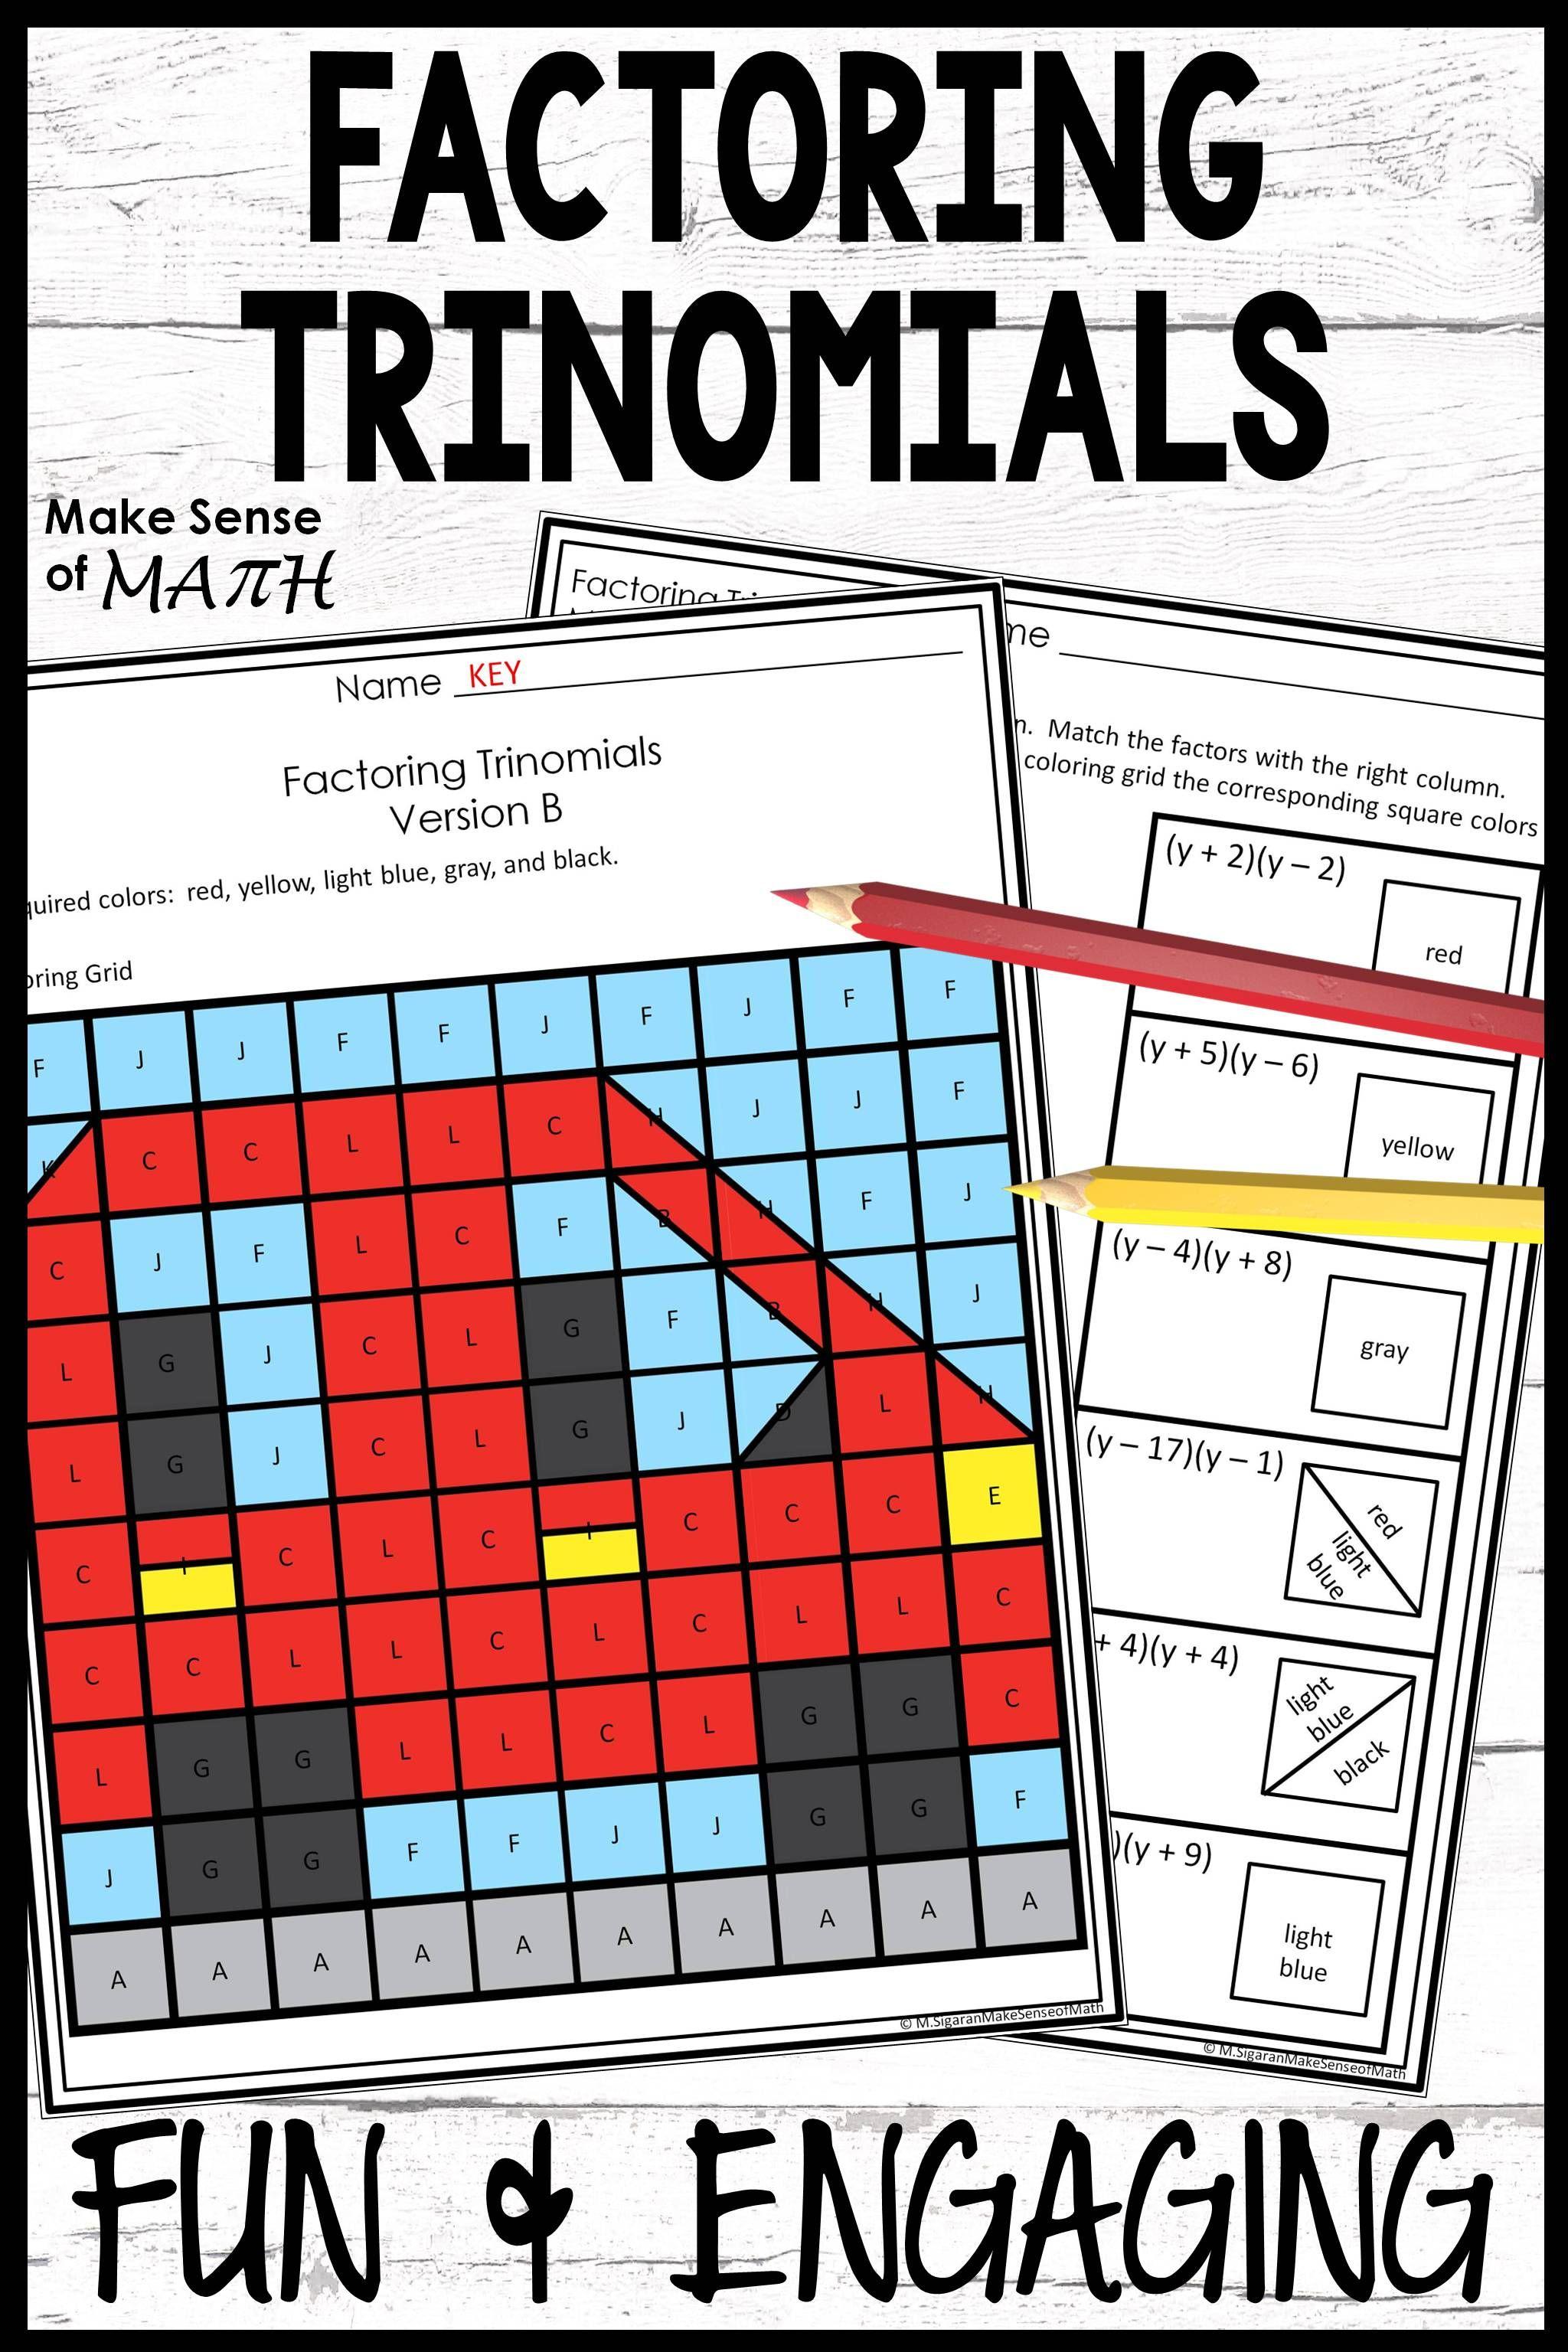 Factoring Trinomials A 1 Activity Math Games Middle School Maths Activities Middle School Middle School Math Classroom